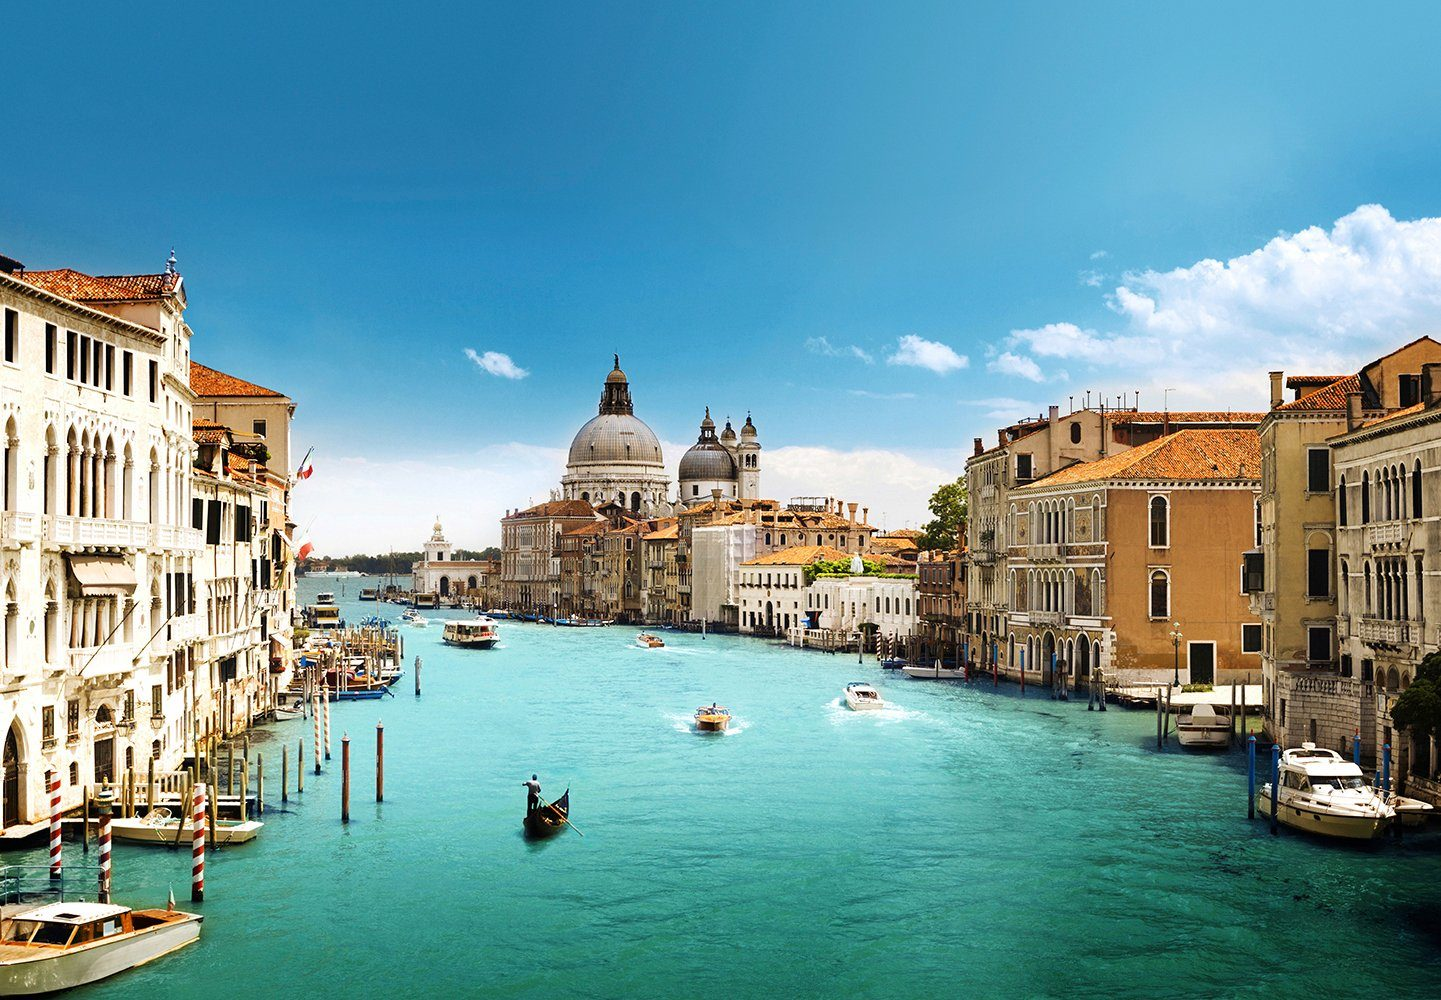 Fototapete »Canal Grande Venice«, 8-teilig, 366x254 cm